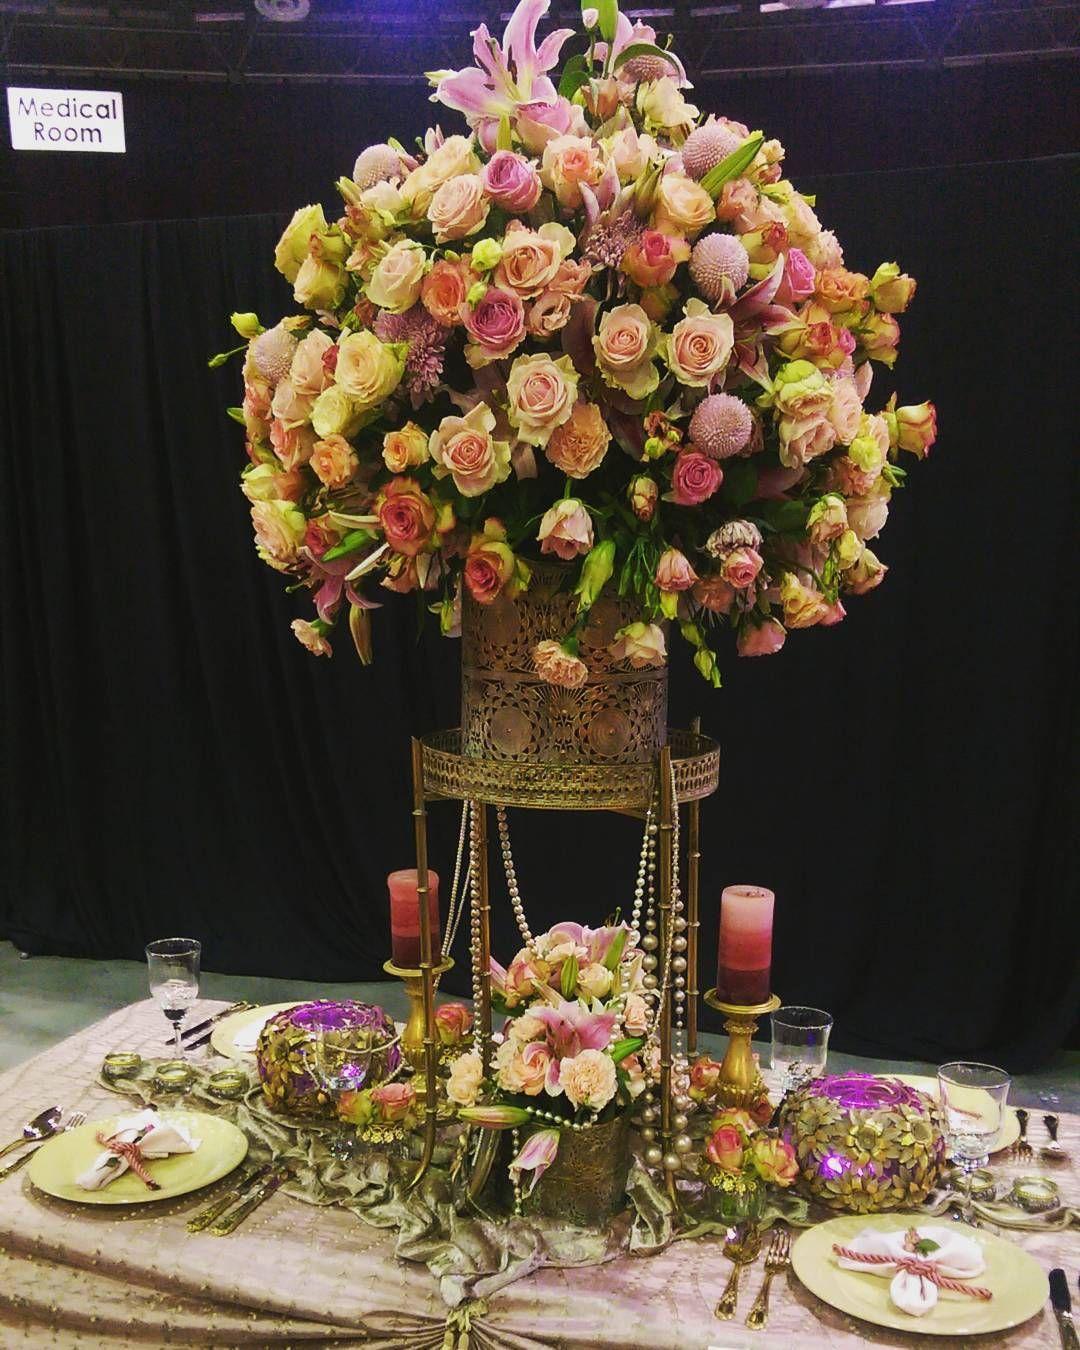 Totally #Royal #Decor @weddingexposa @Ticketprodome #weddingexpo2016 #TheLifesWay #photoyatra www.thelifesway.com